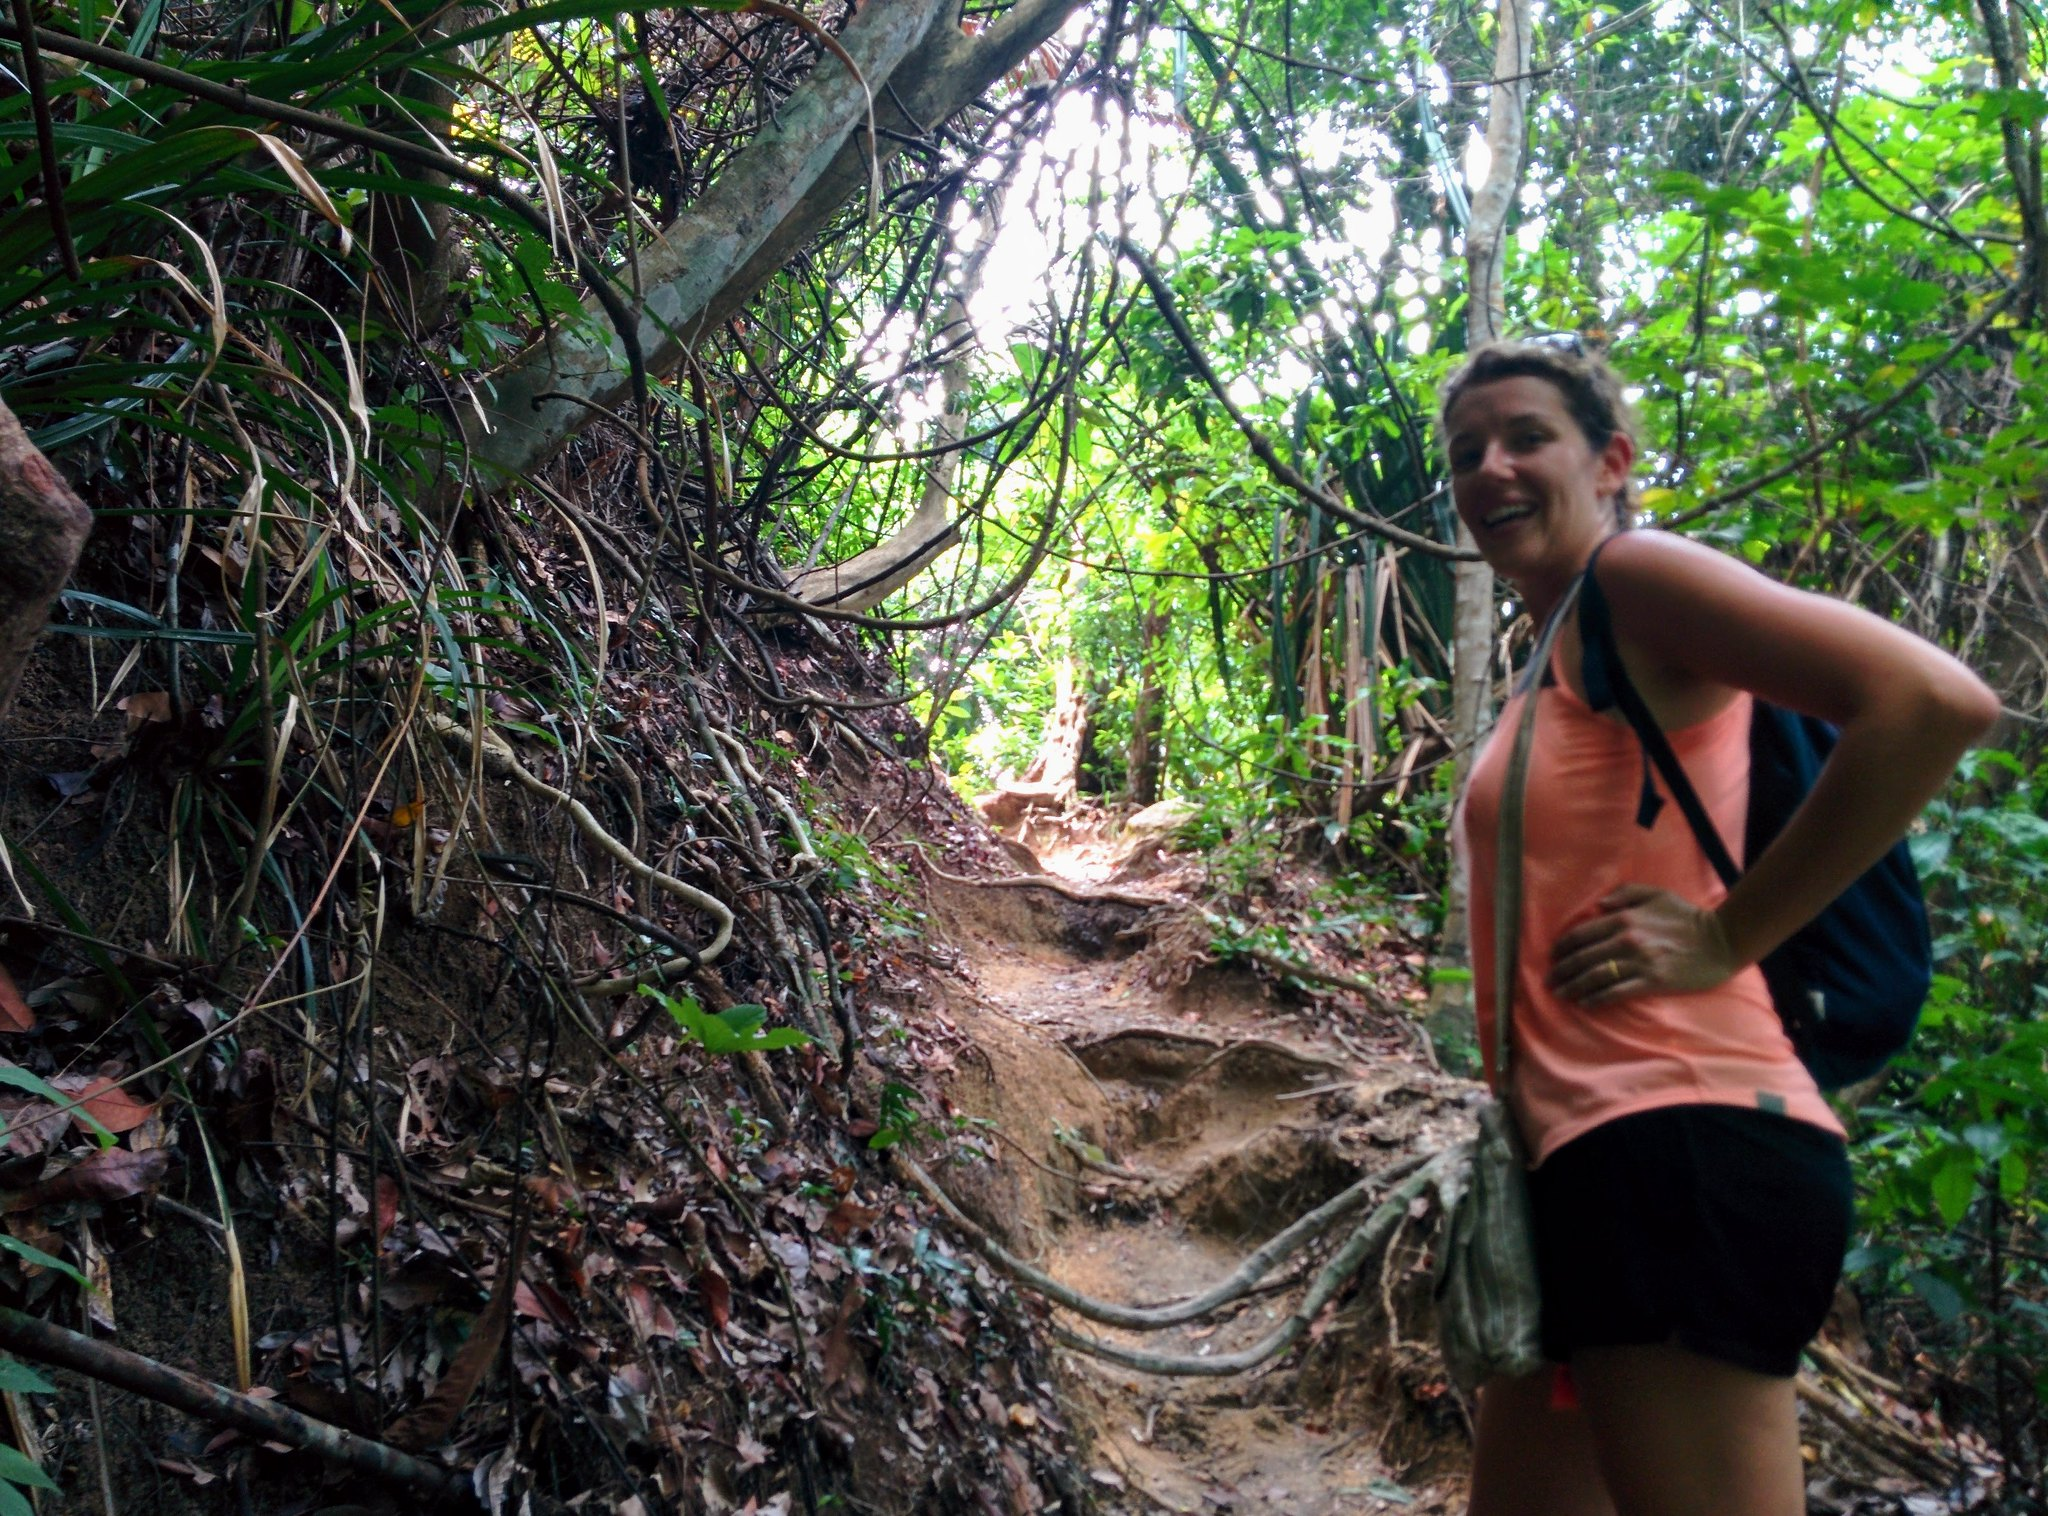 Marine on the jungle trail